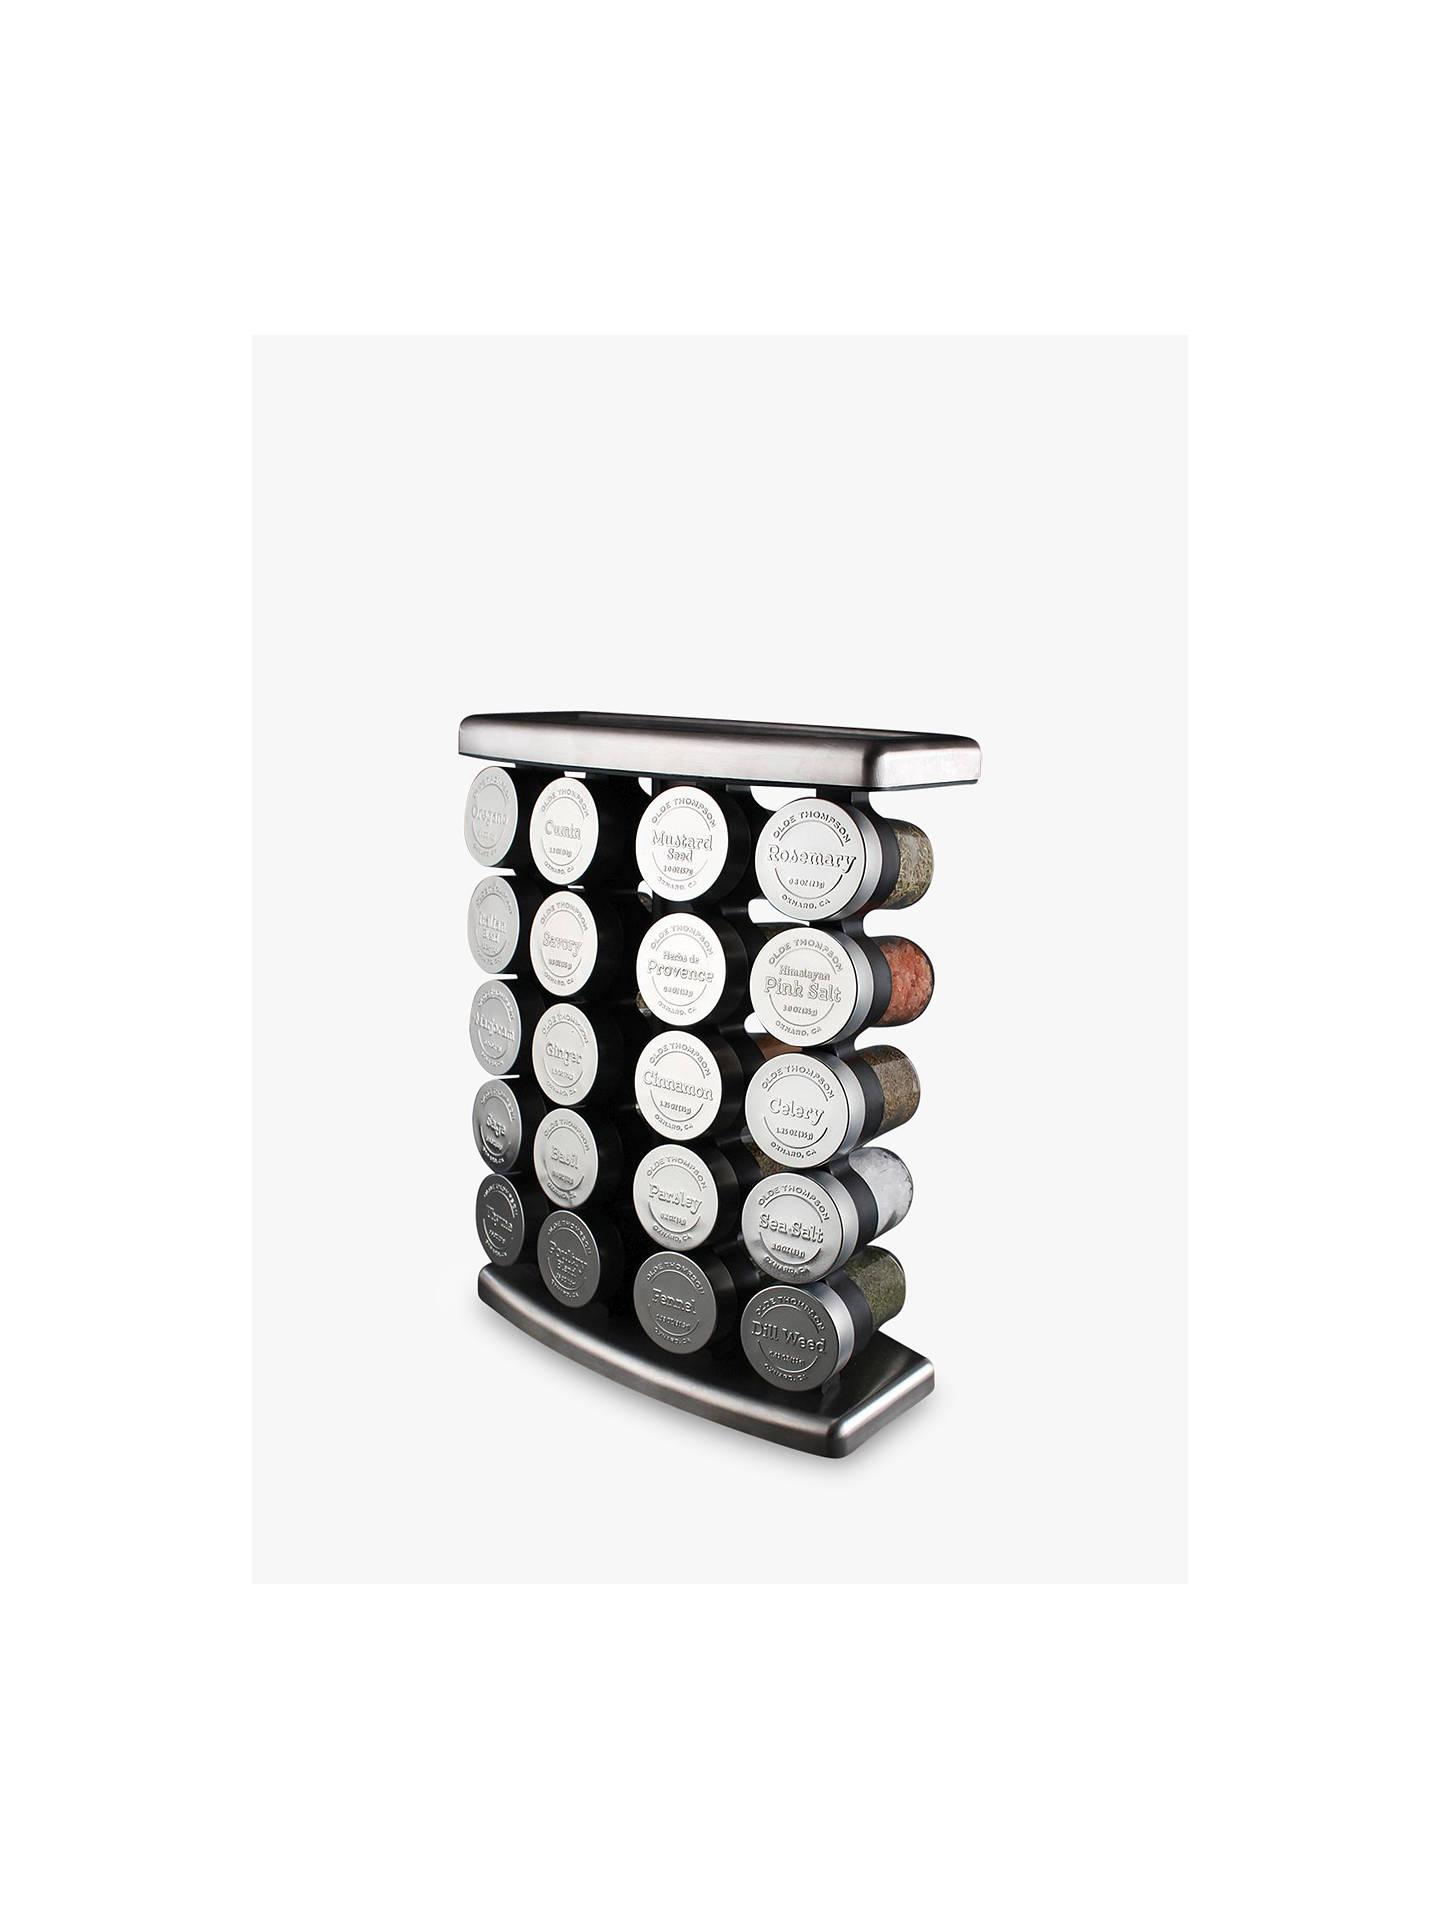 Buyolde thompson 20 jar embossed stainless steel spice rack online at johnlewis com